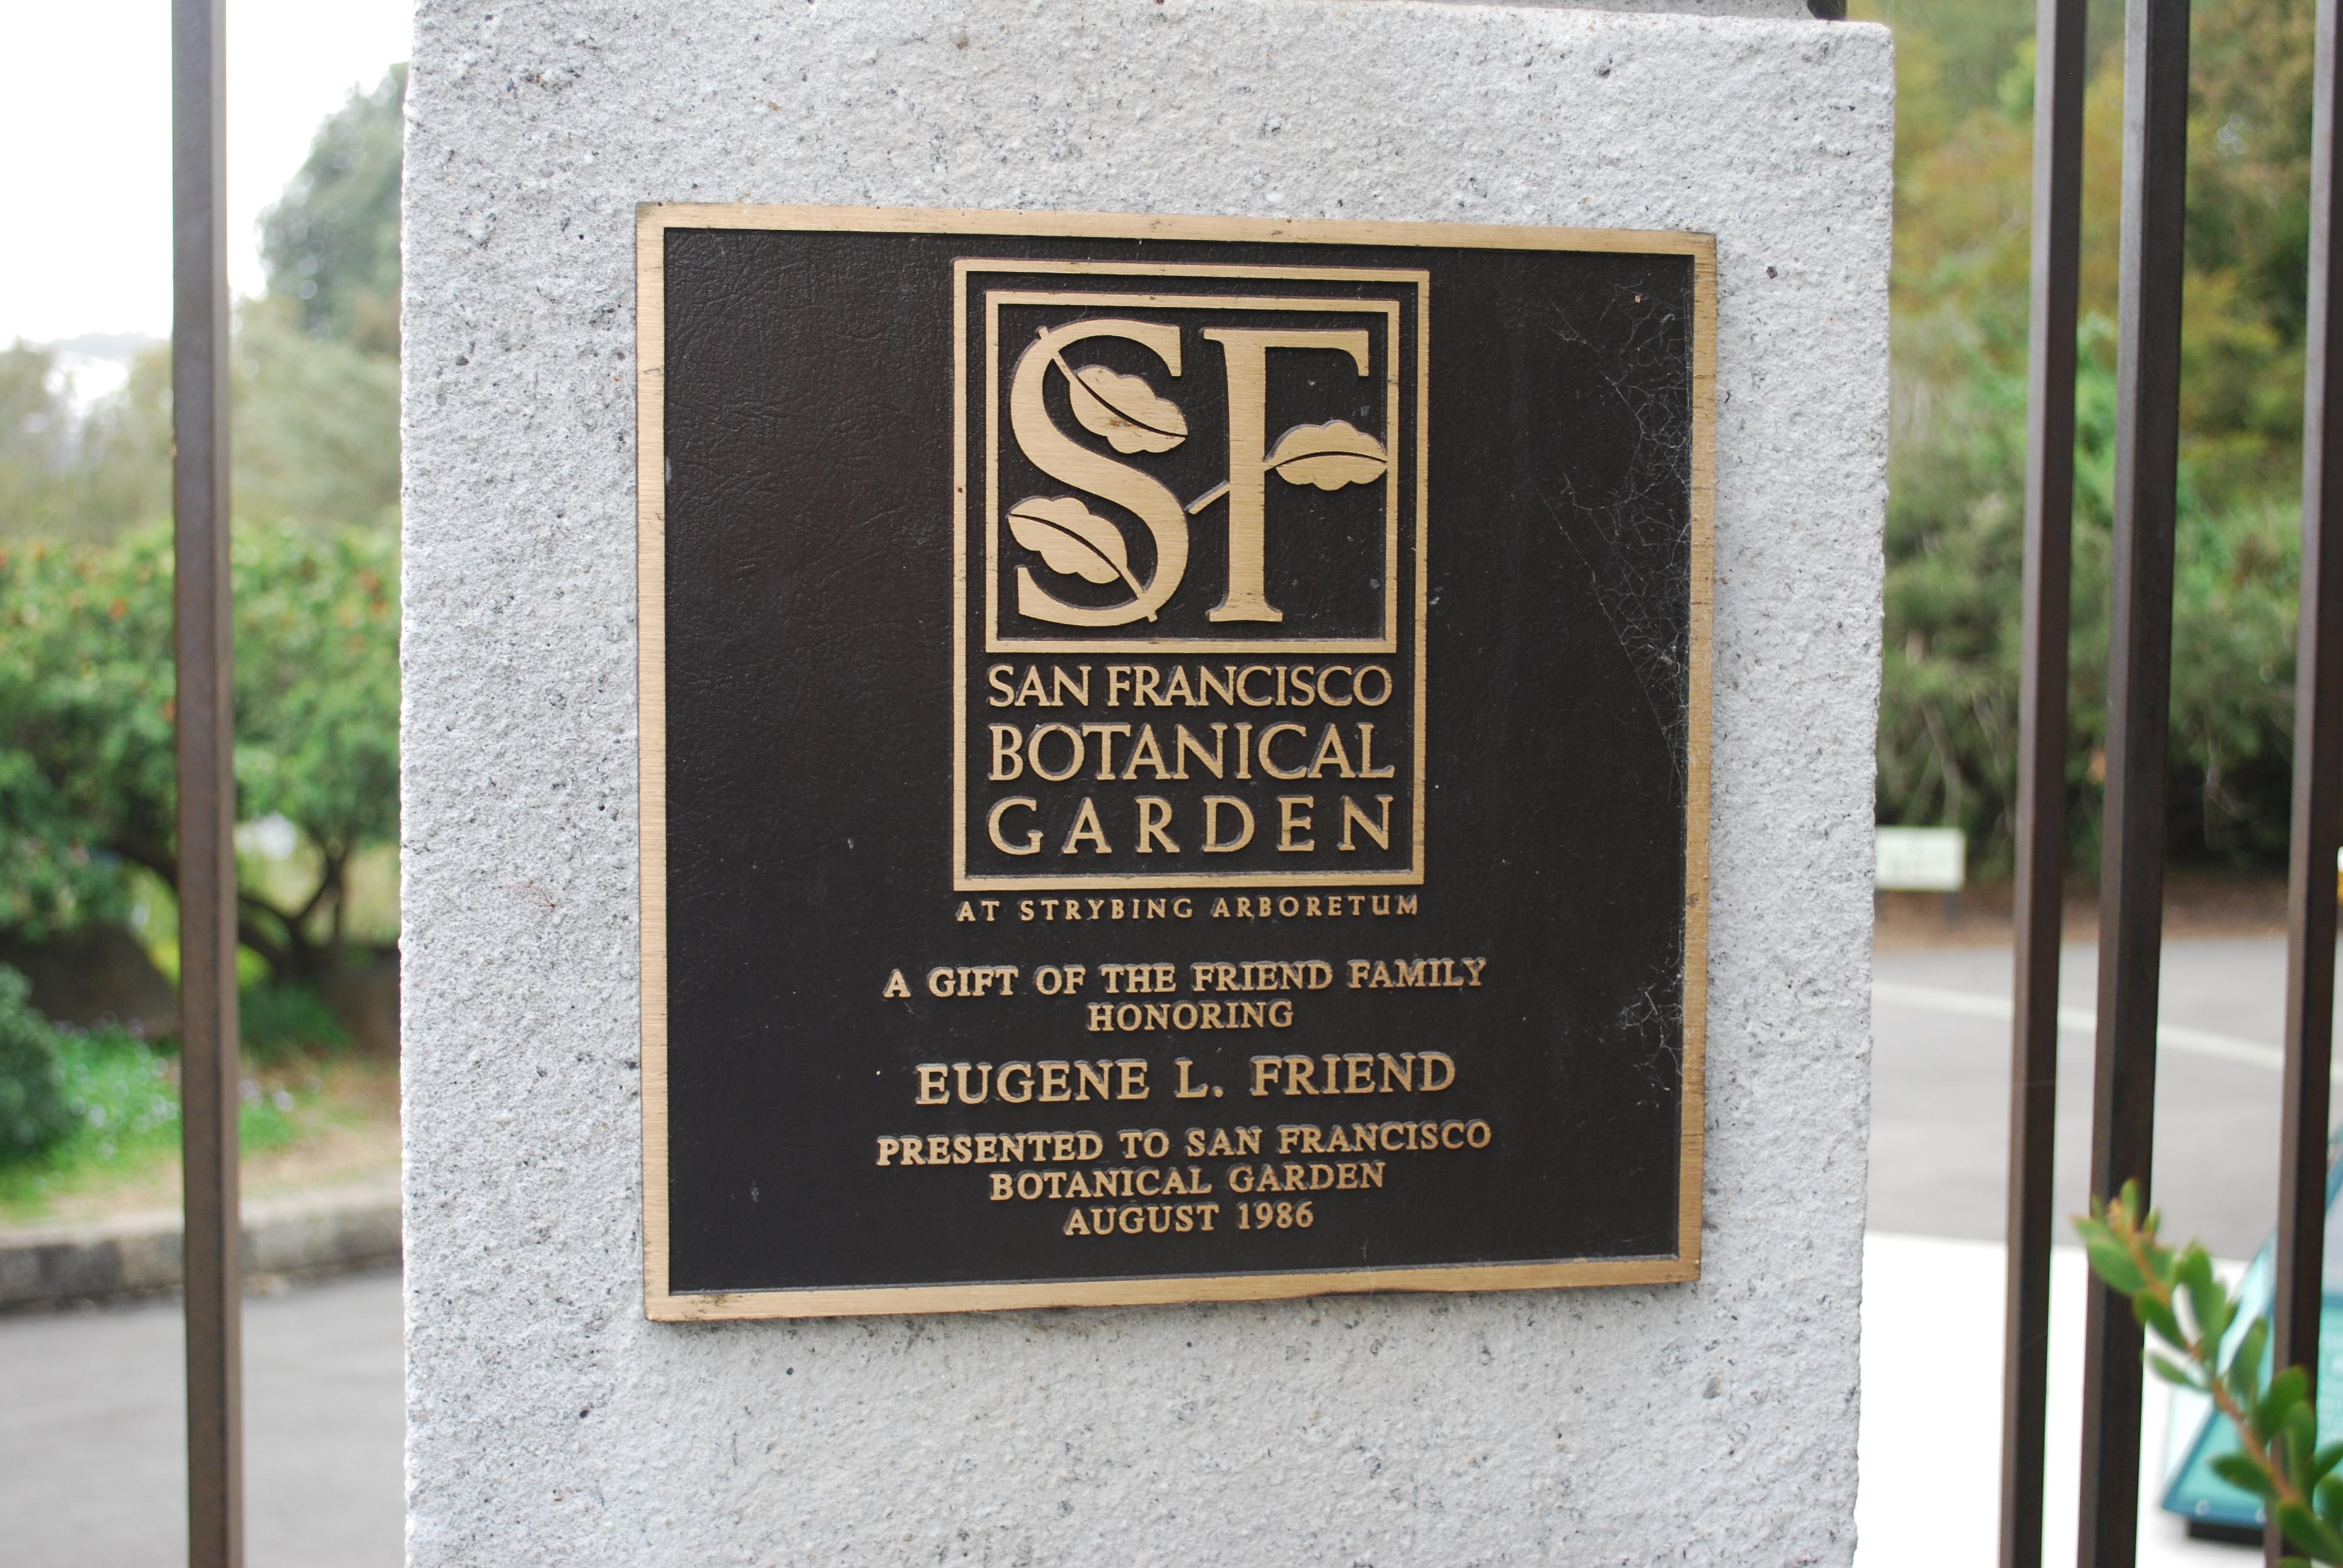 In Golden Gate park